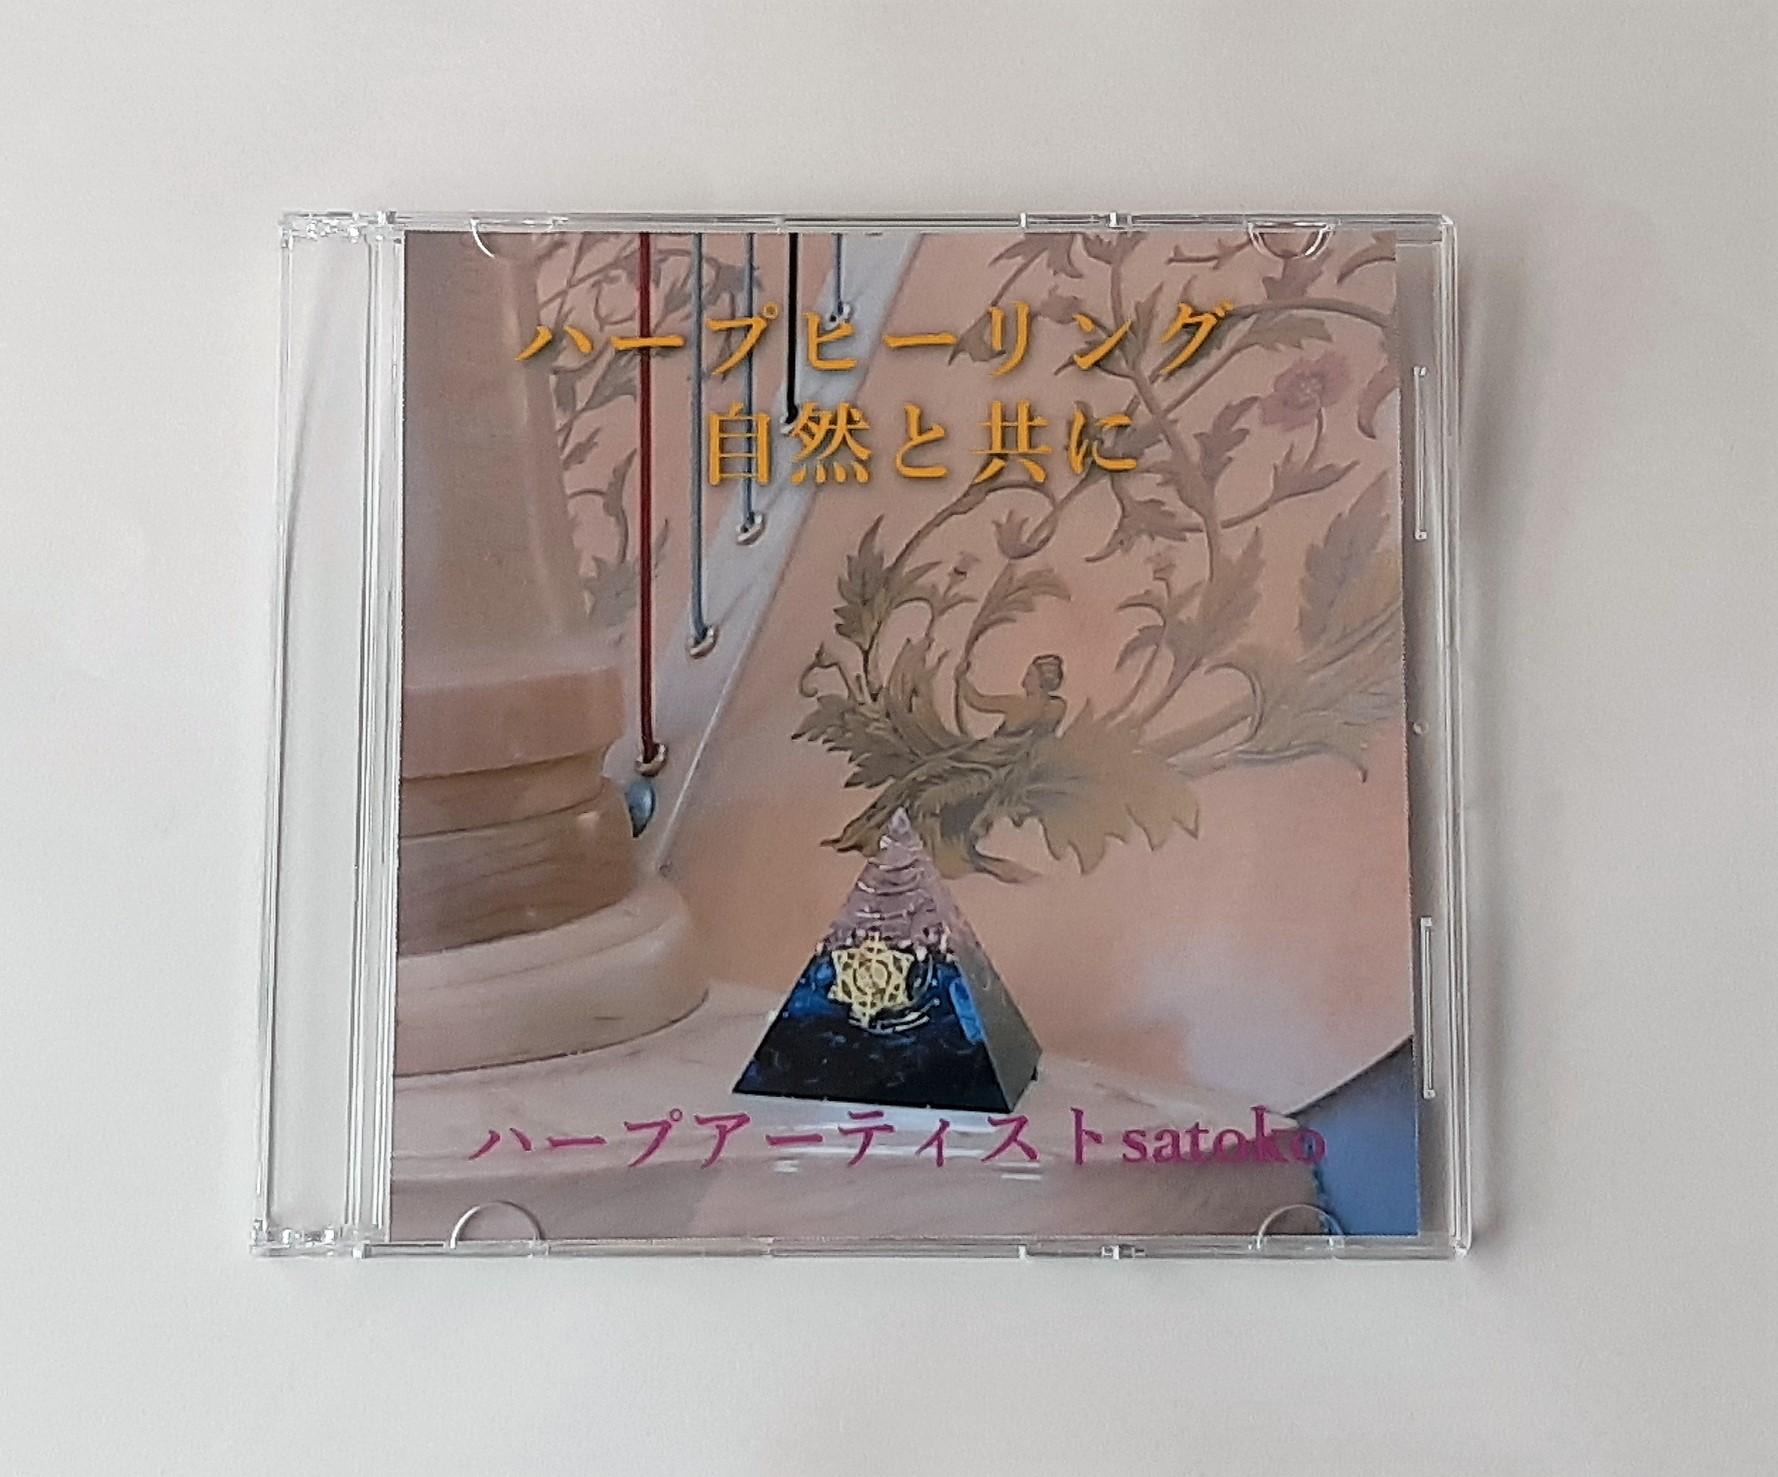 Harp Artist Satoko's CD (1)